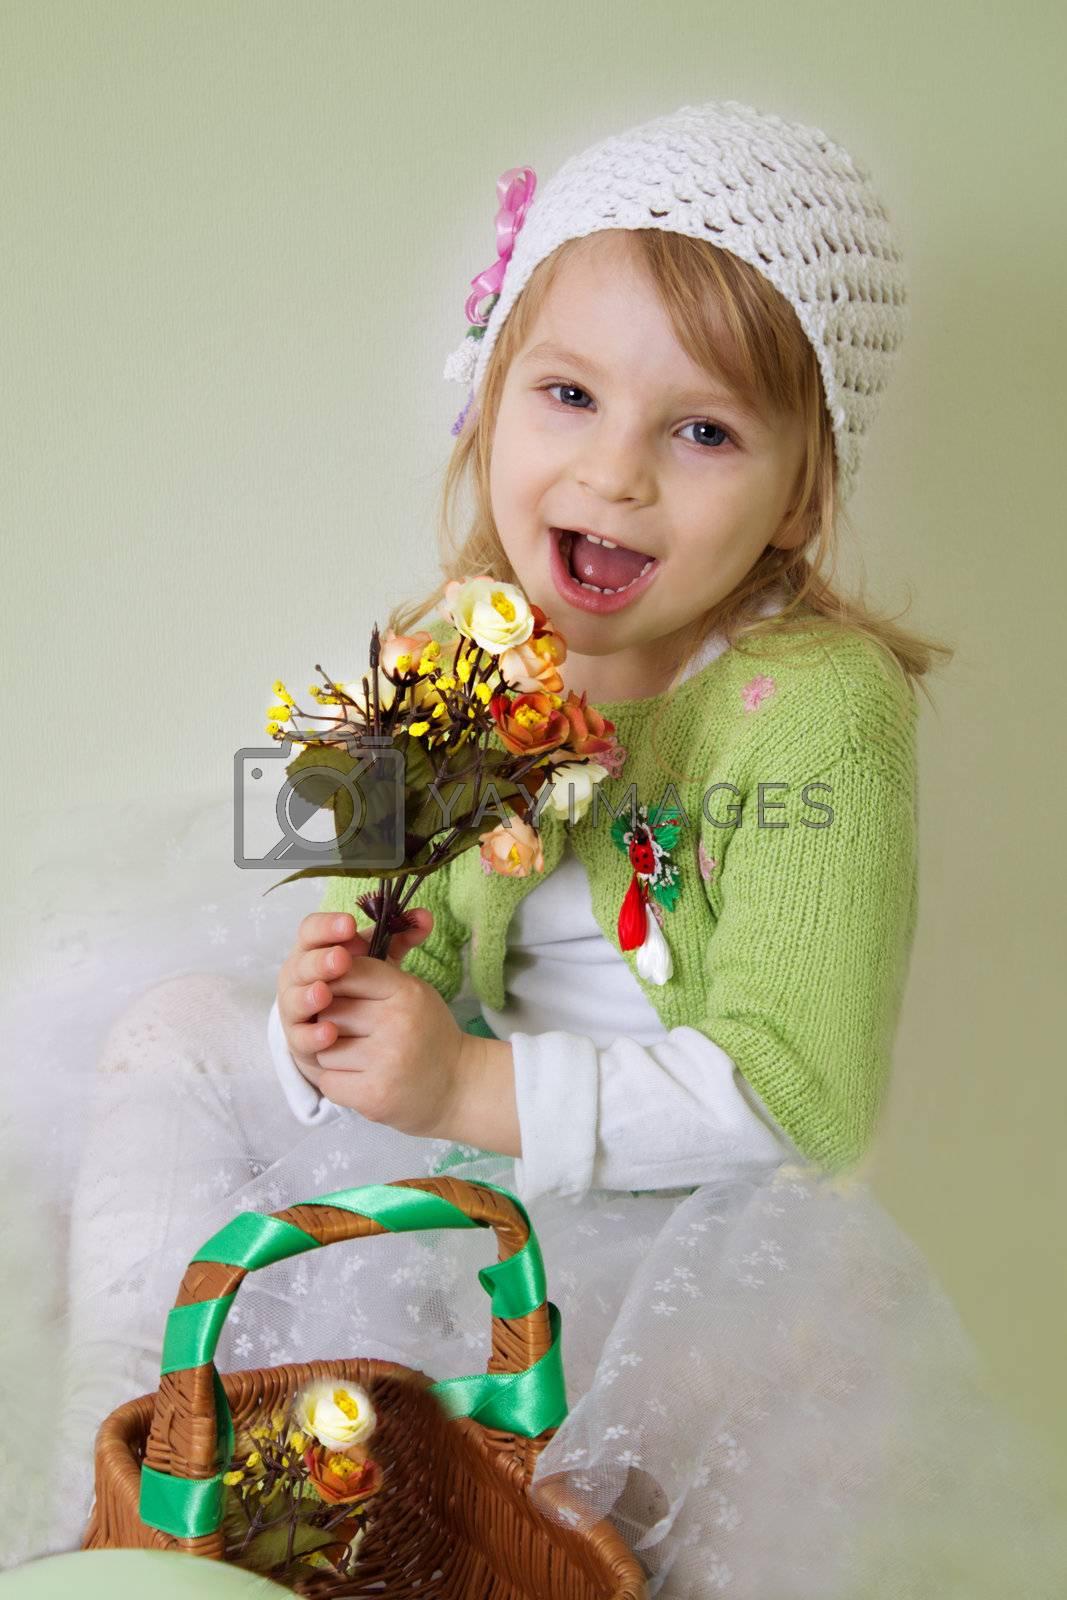 Cute girl enjoying spring flower blossom with basket